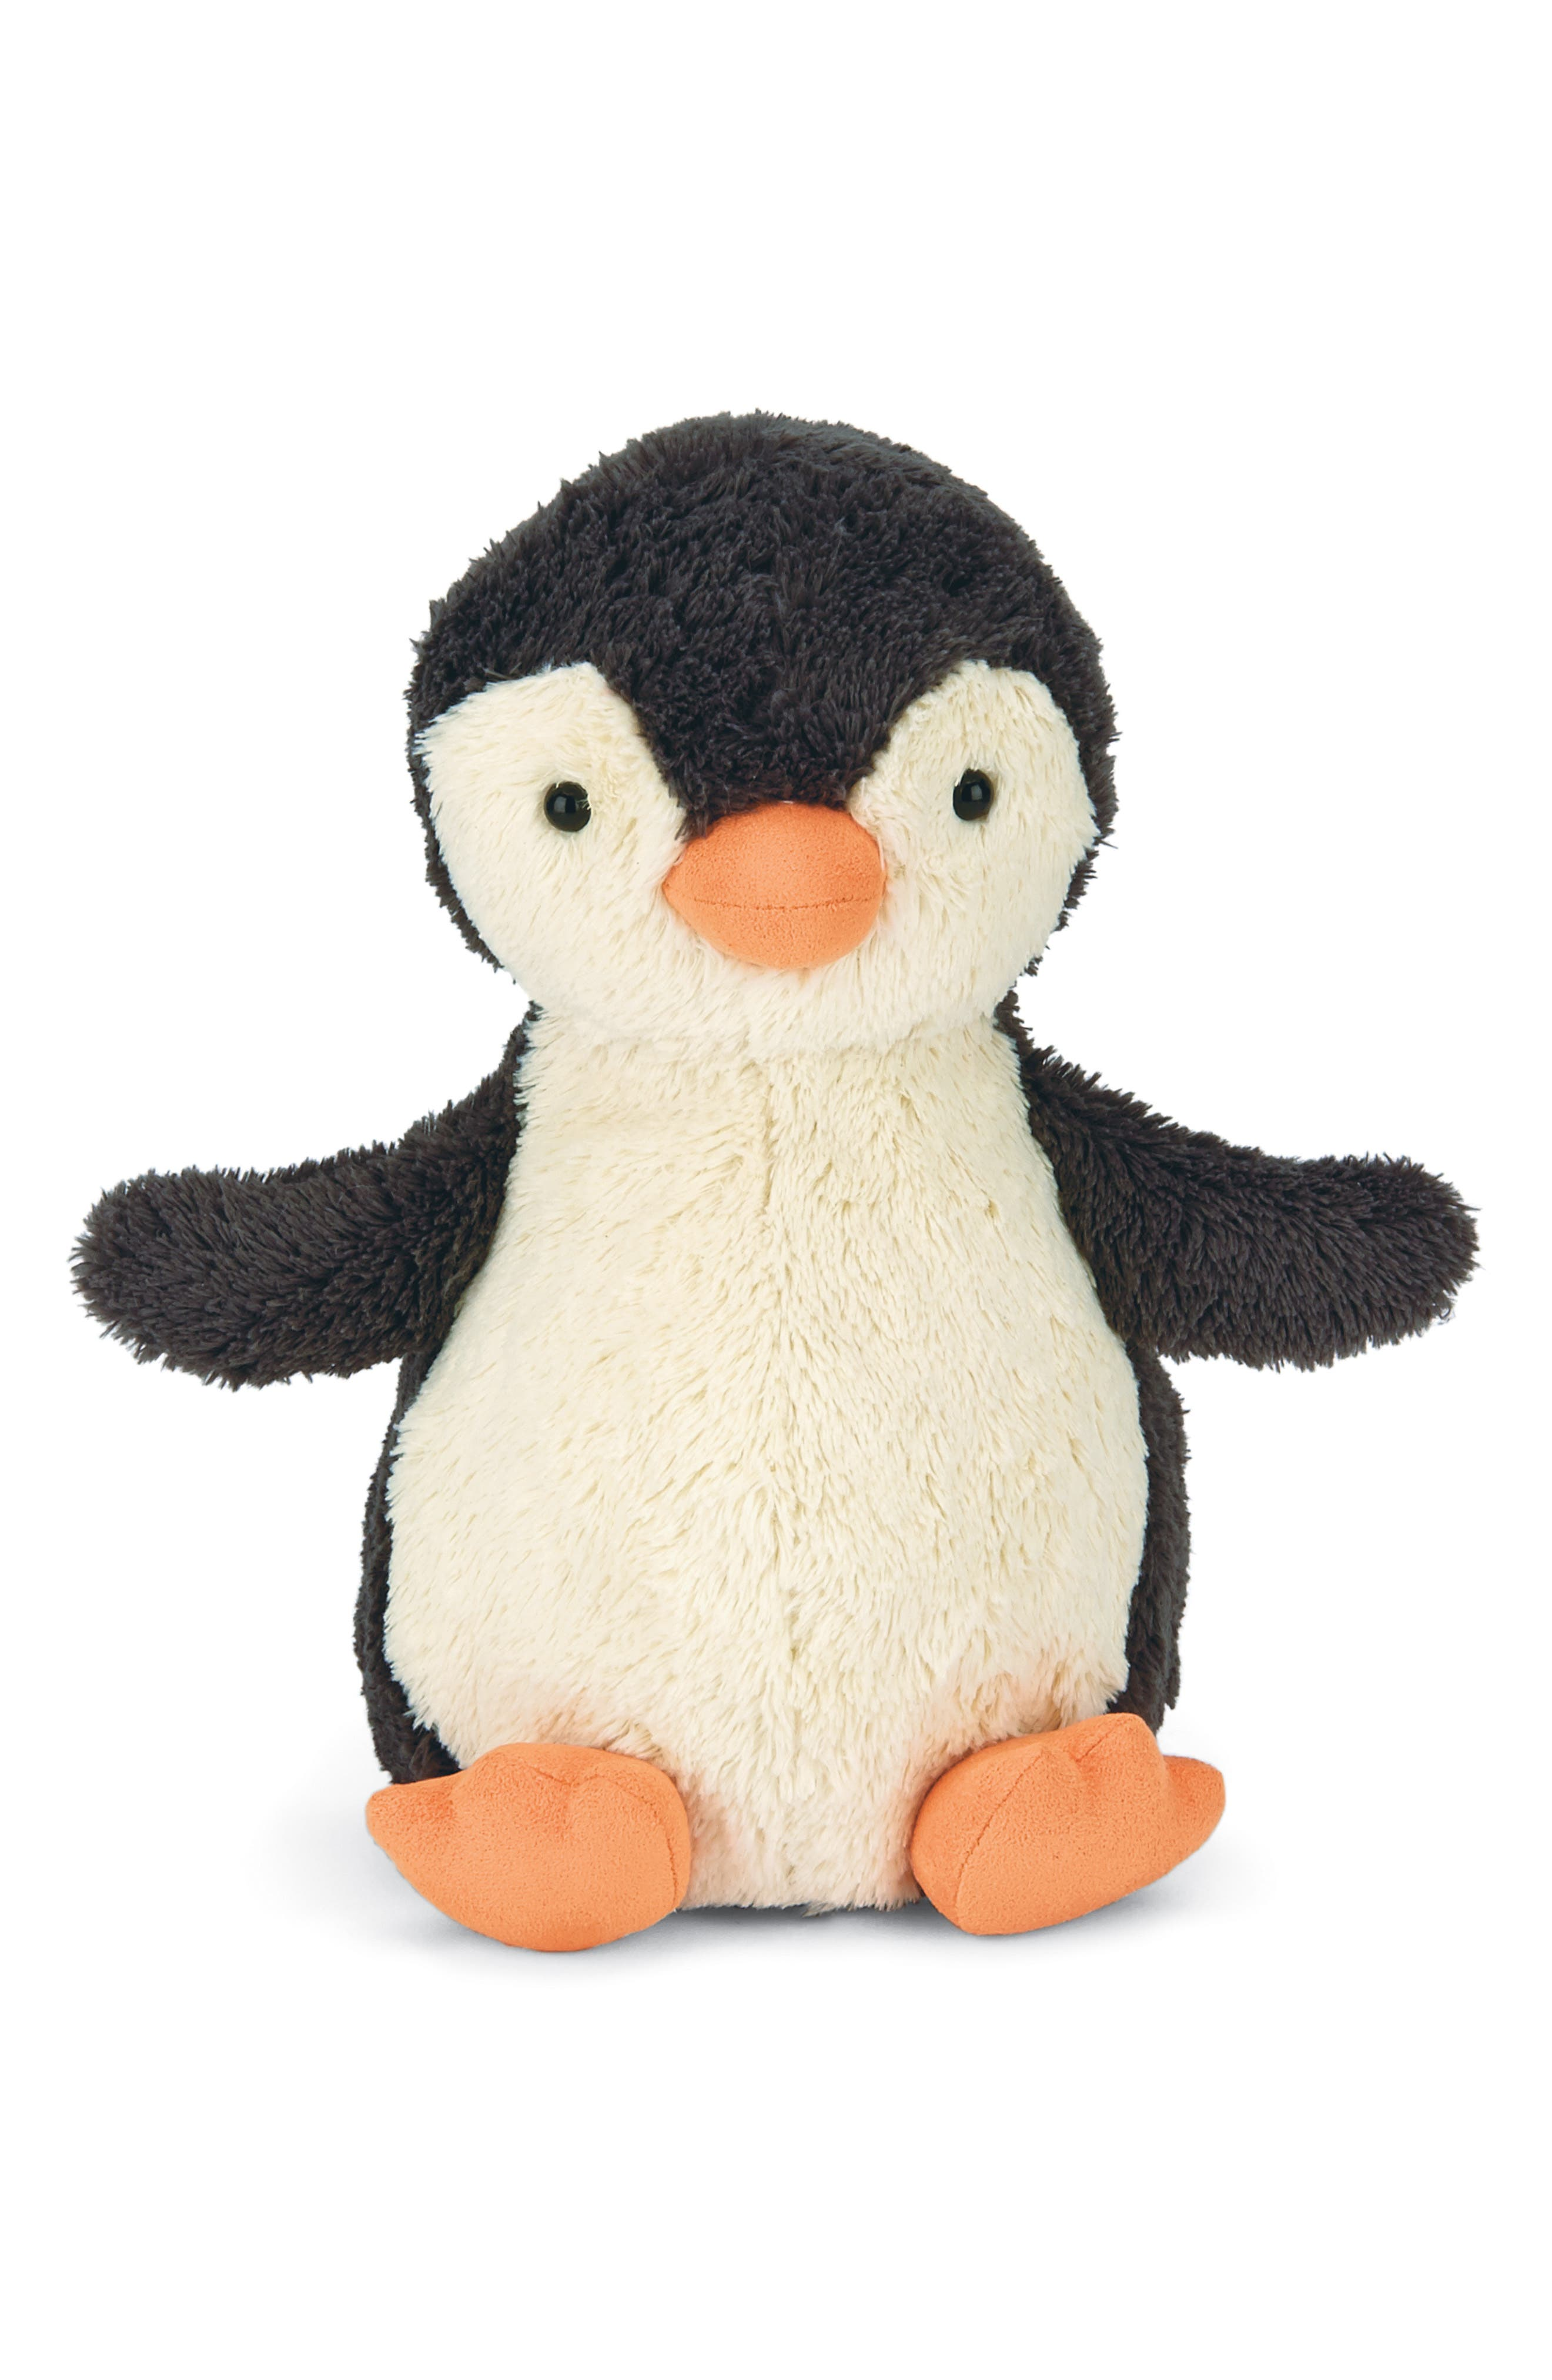 Medium Pippet Penguin Stuffed Animal,                         Main,                         color, BLACK / WHITE